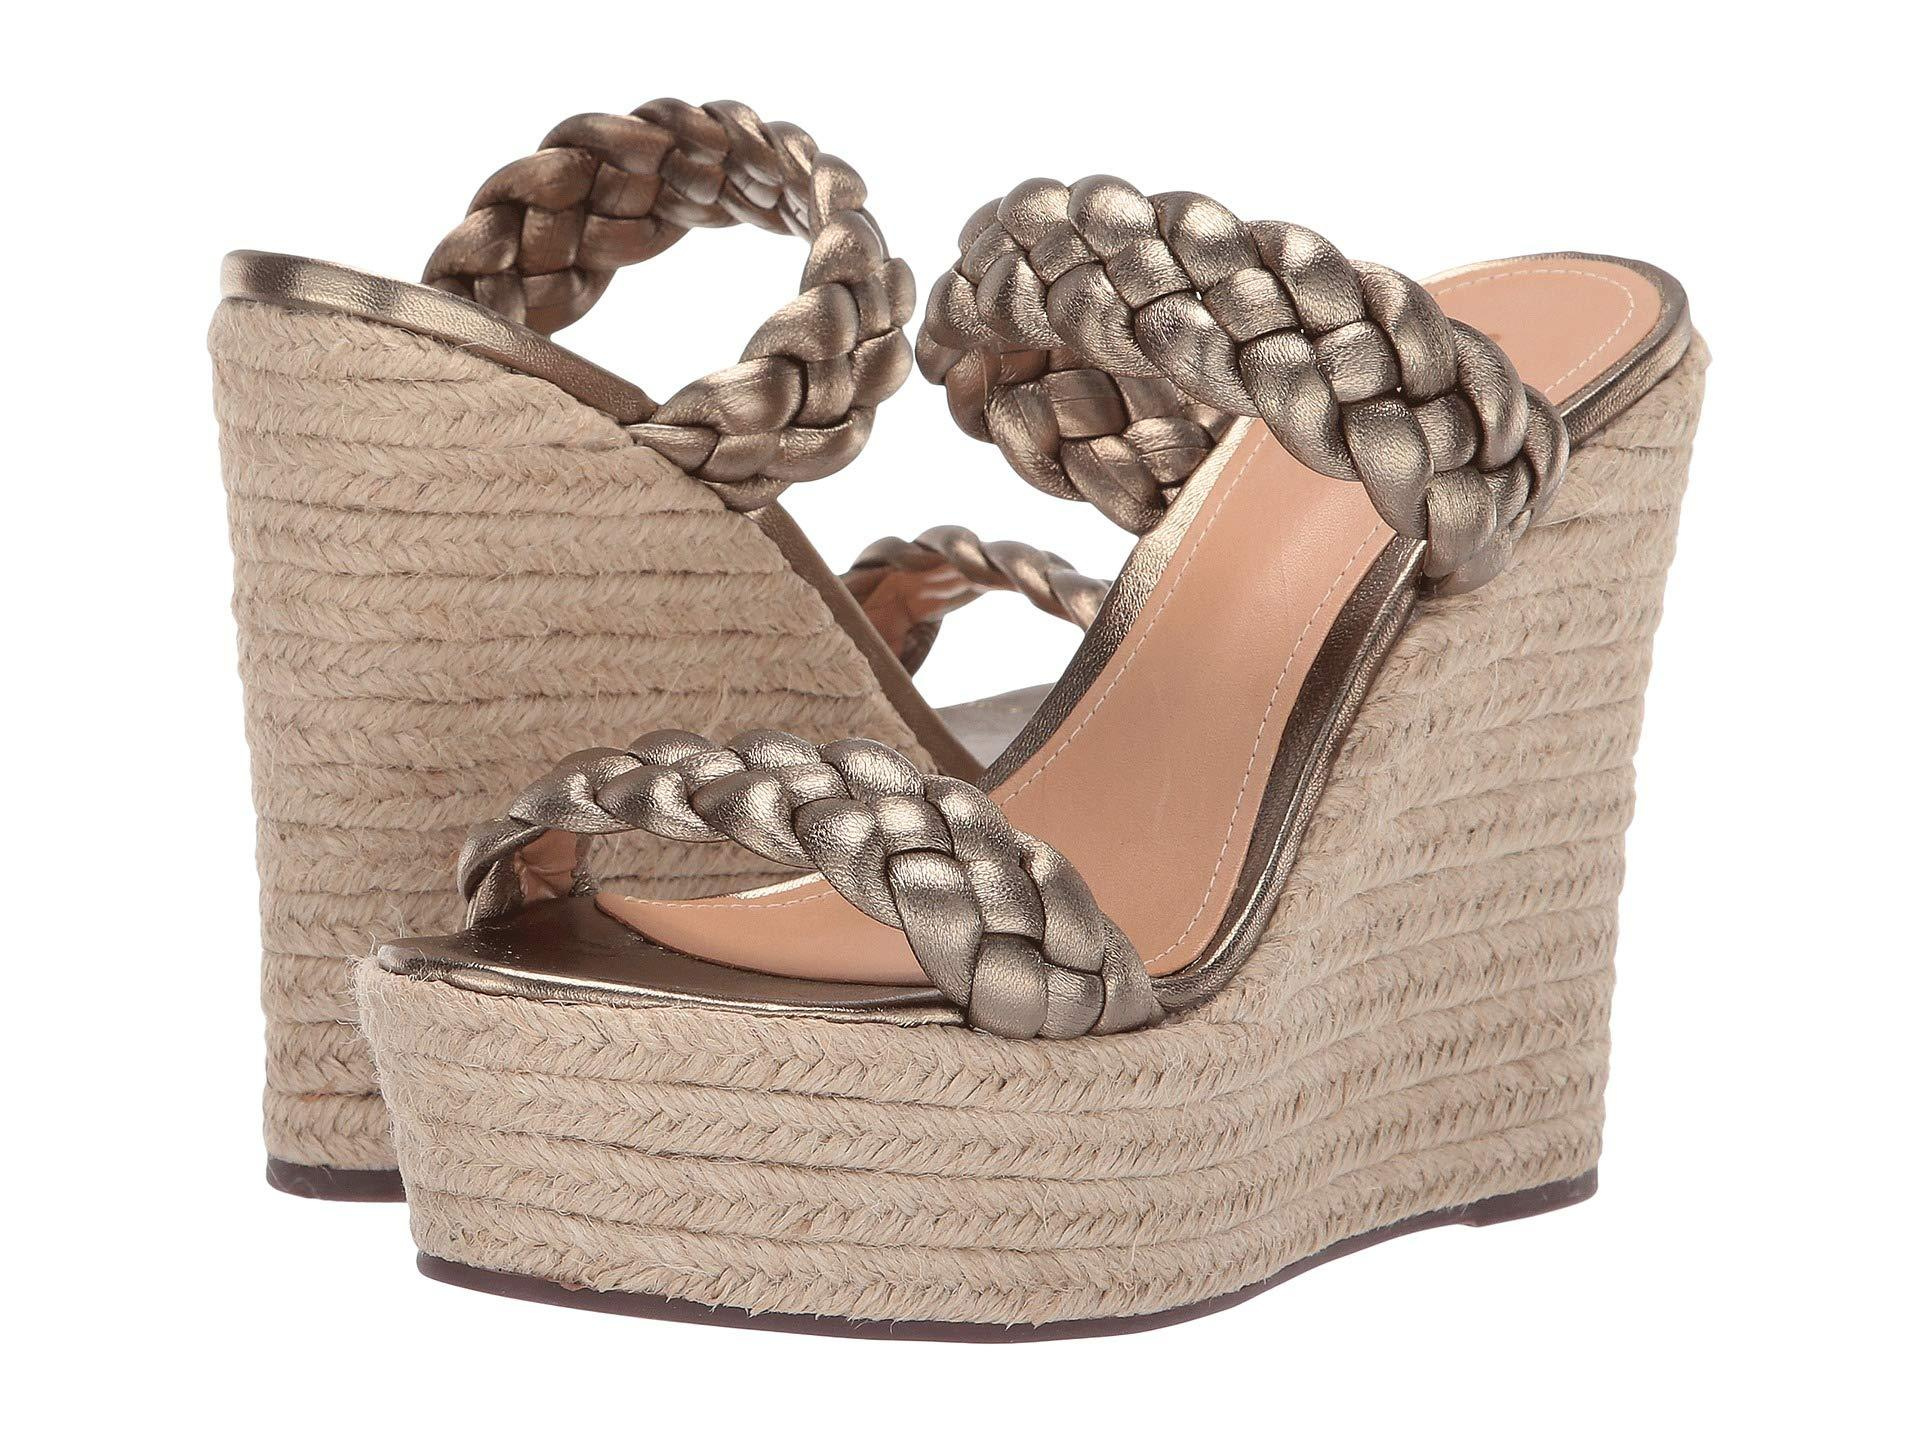 c68ed8c2c06 Lyst - Schutz Dyandre (honey Beige) Women s Sandals